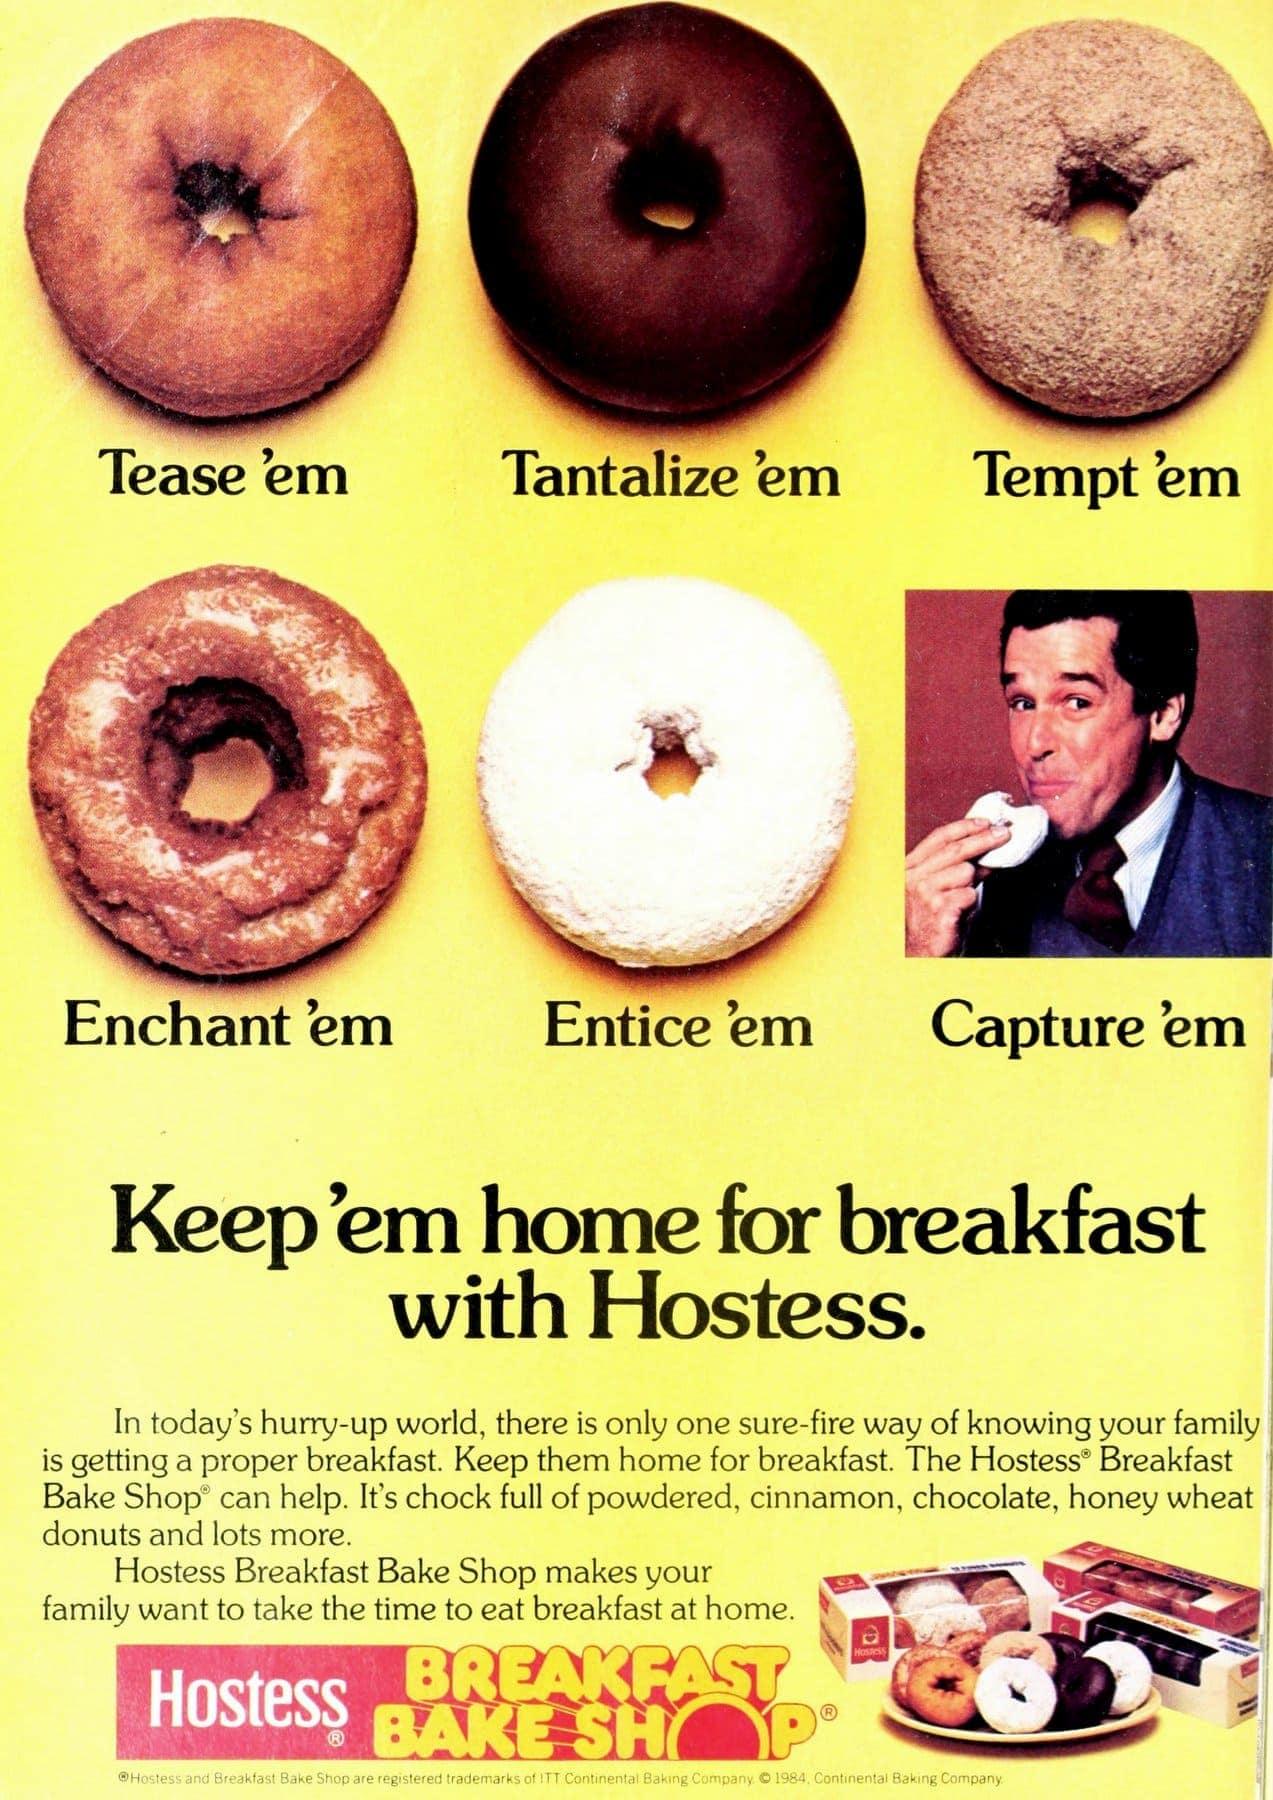 Vintage Hostess Breakfast Bake Shop donuts from 1984 (1)